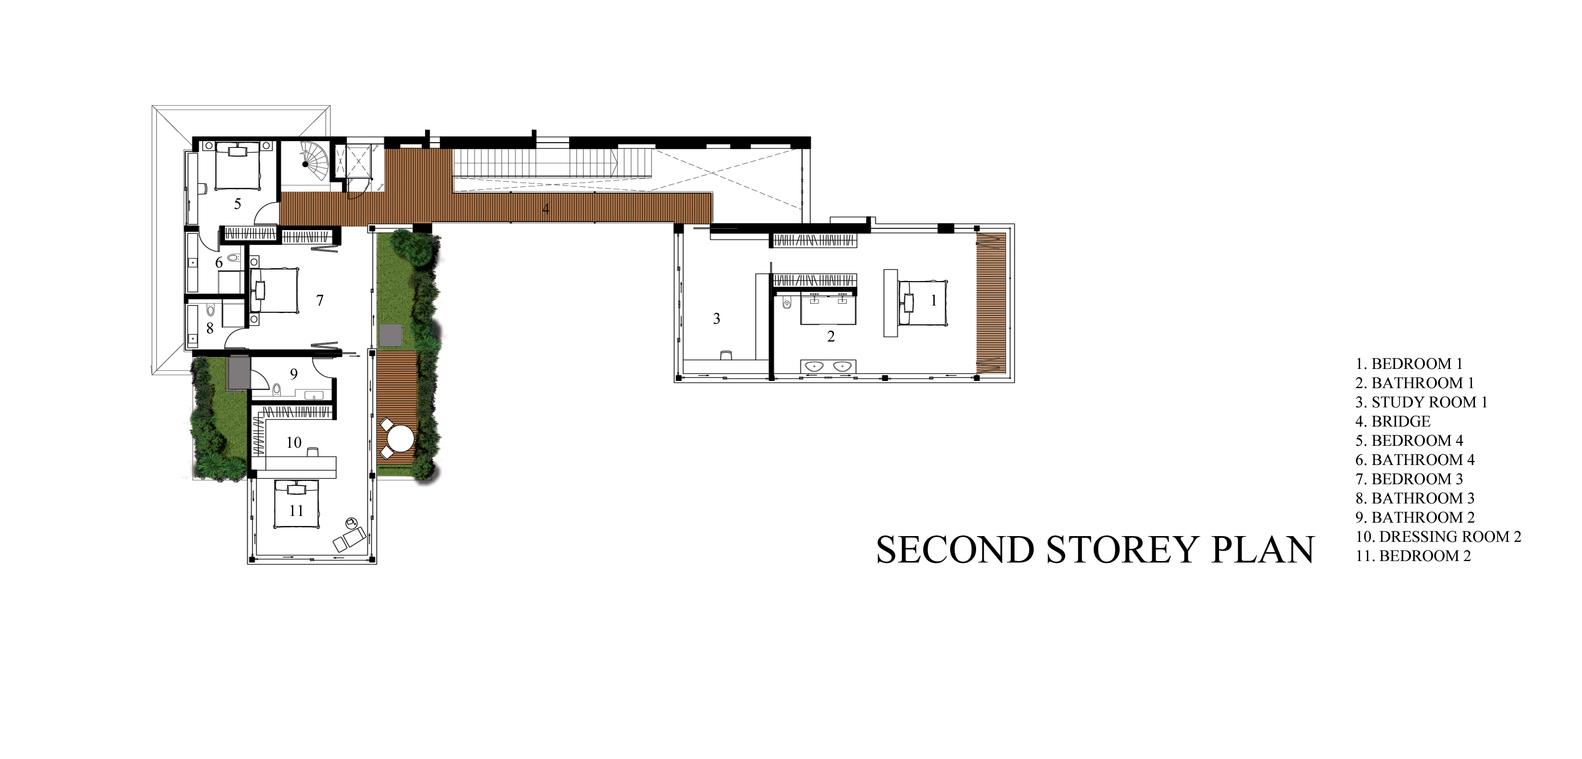 Dalvey_House_Second_Storey_Plan.jpg